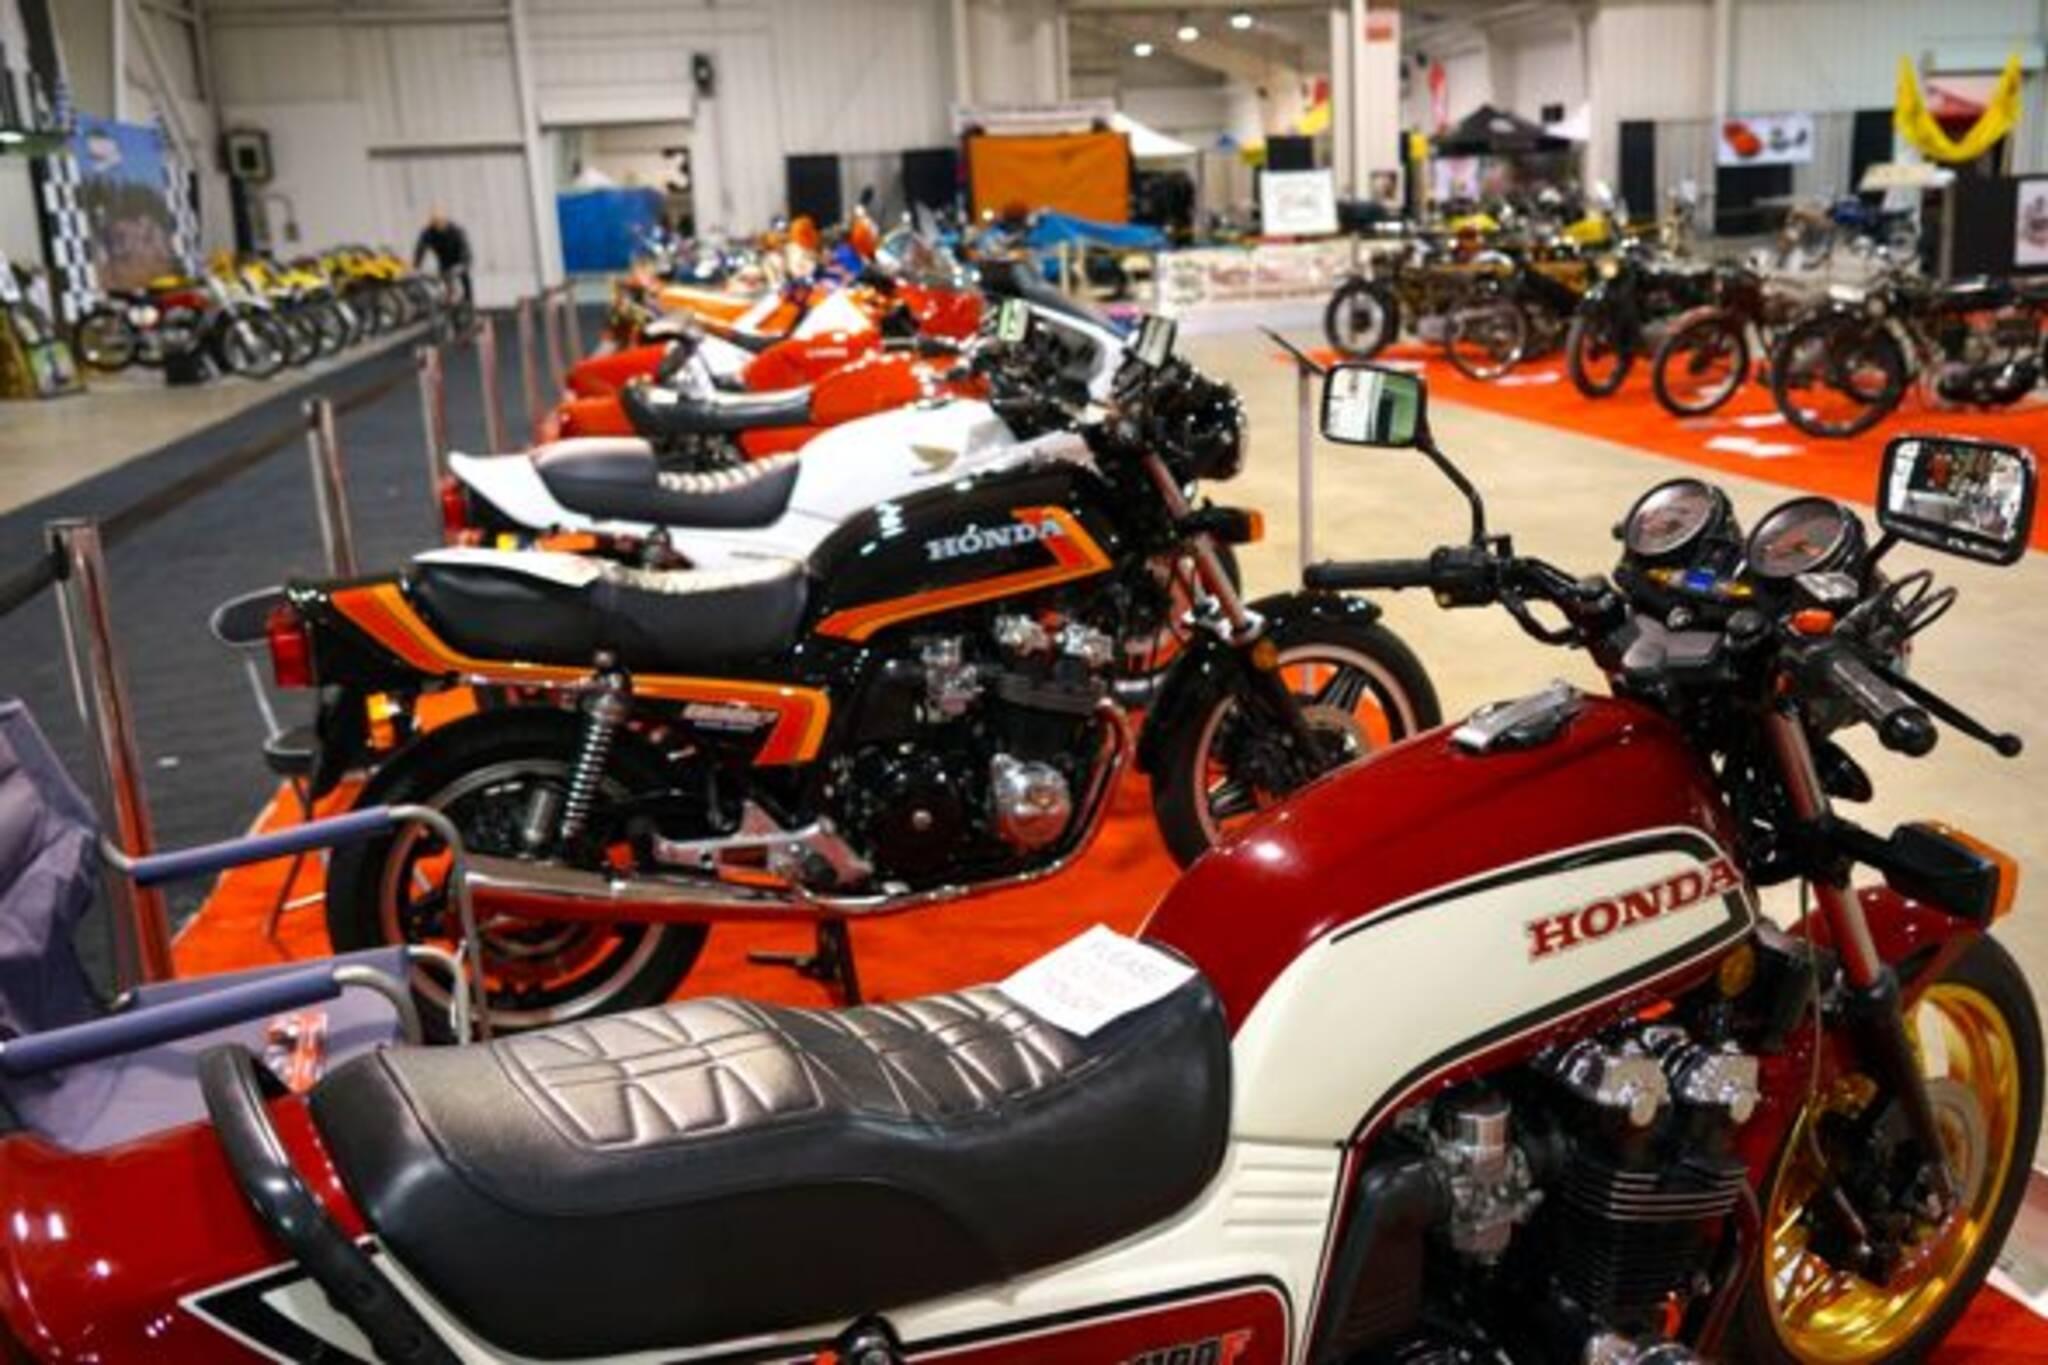 Motorcycle Supershow in Toronto